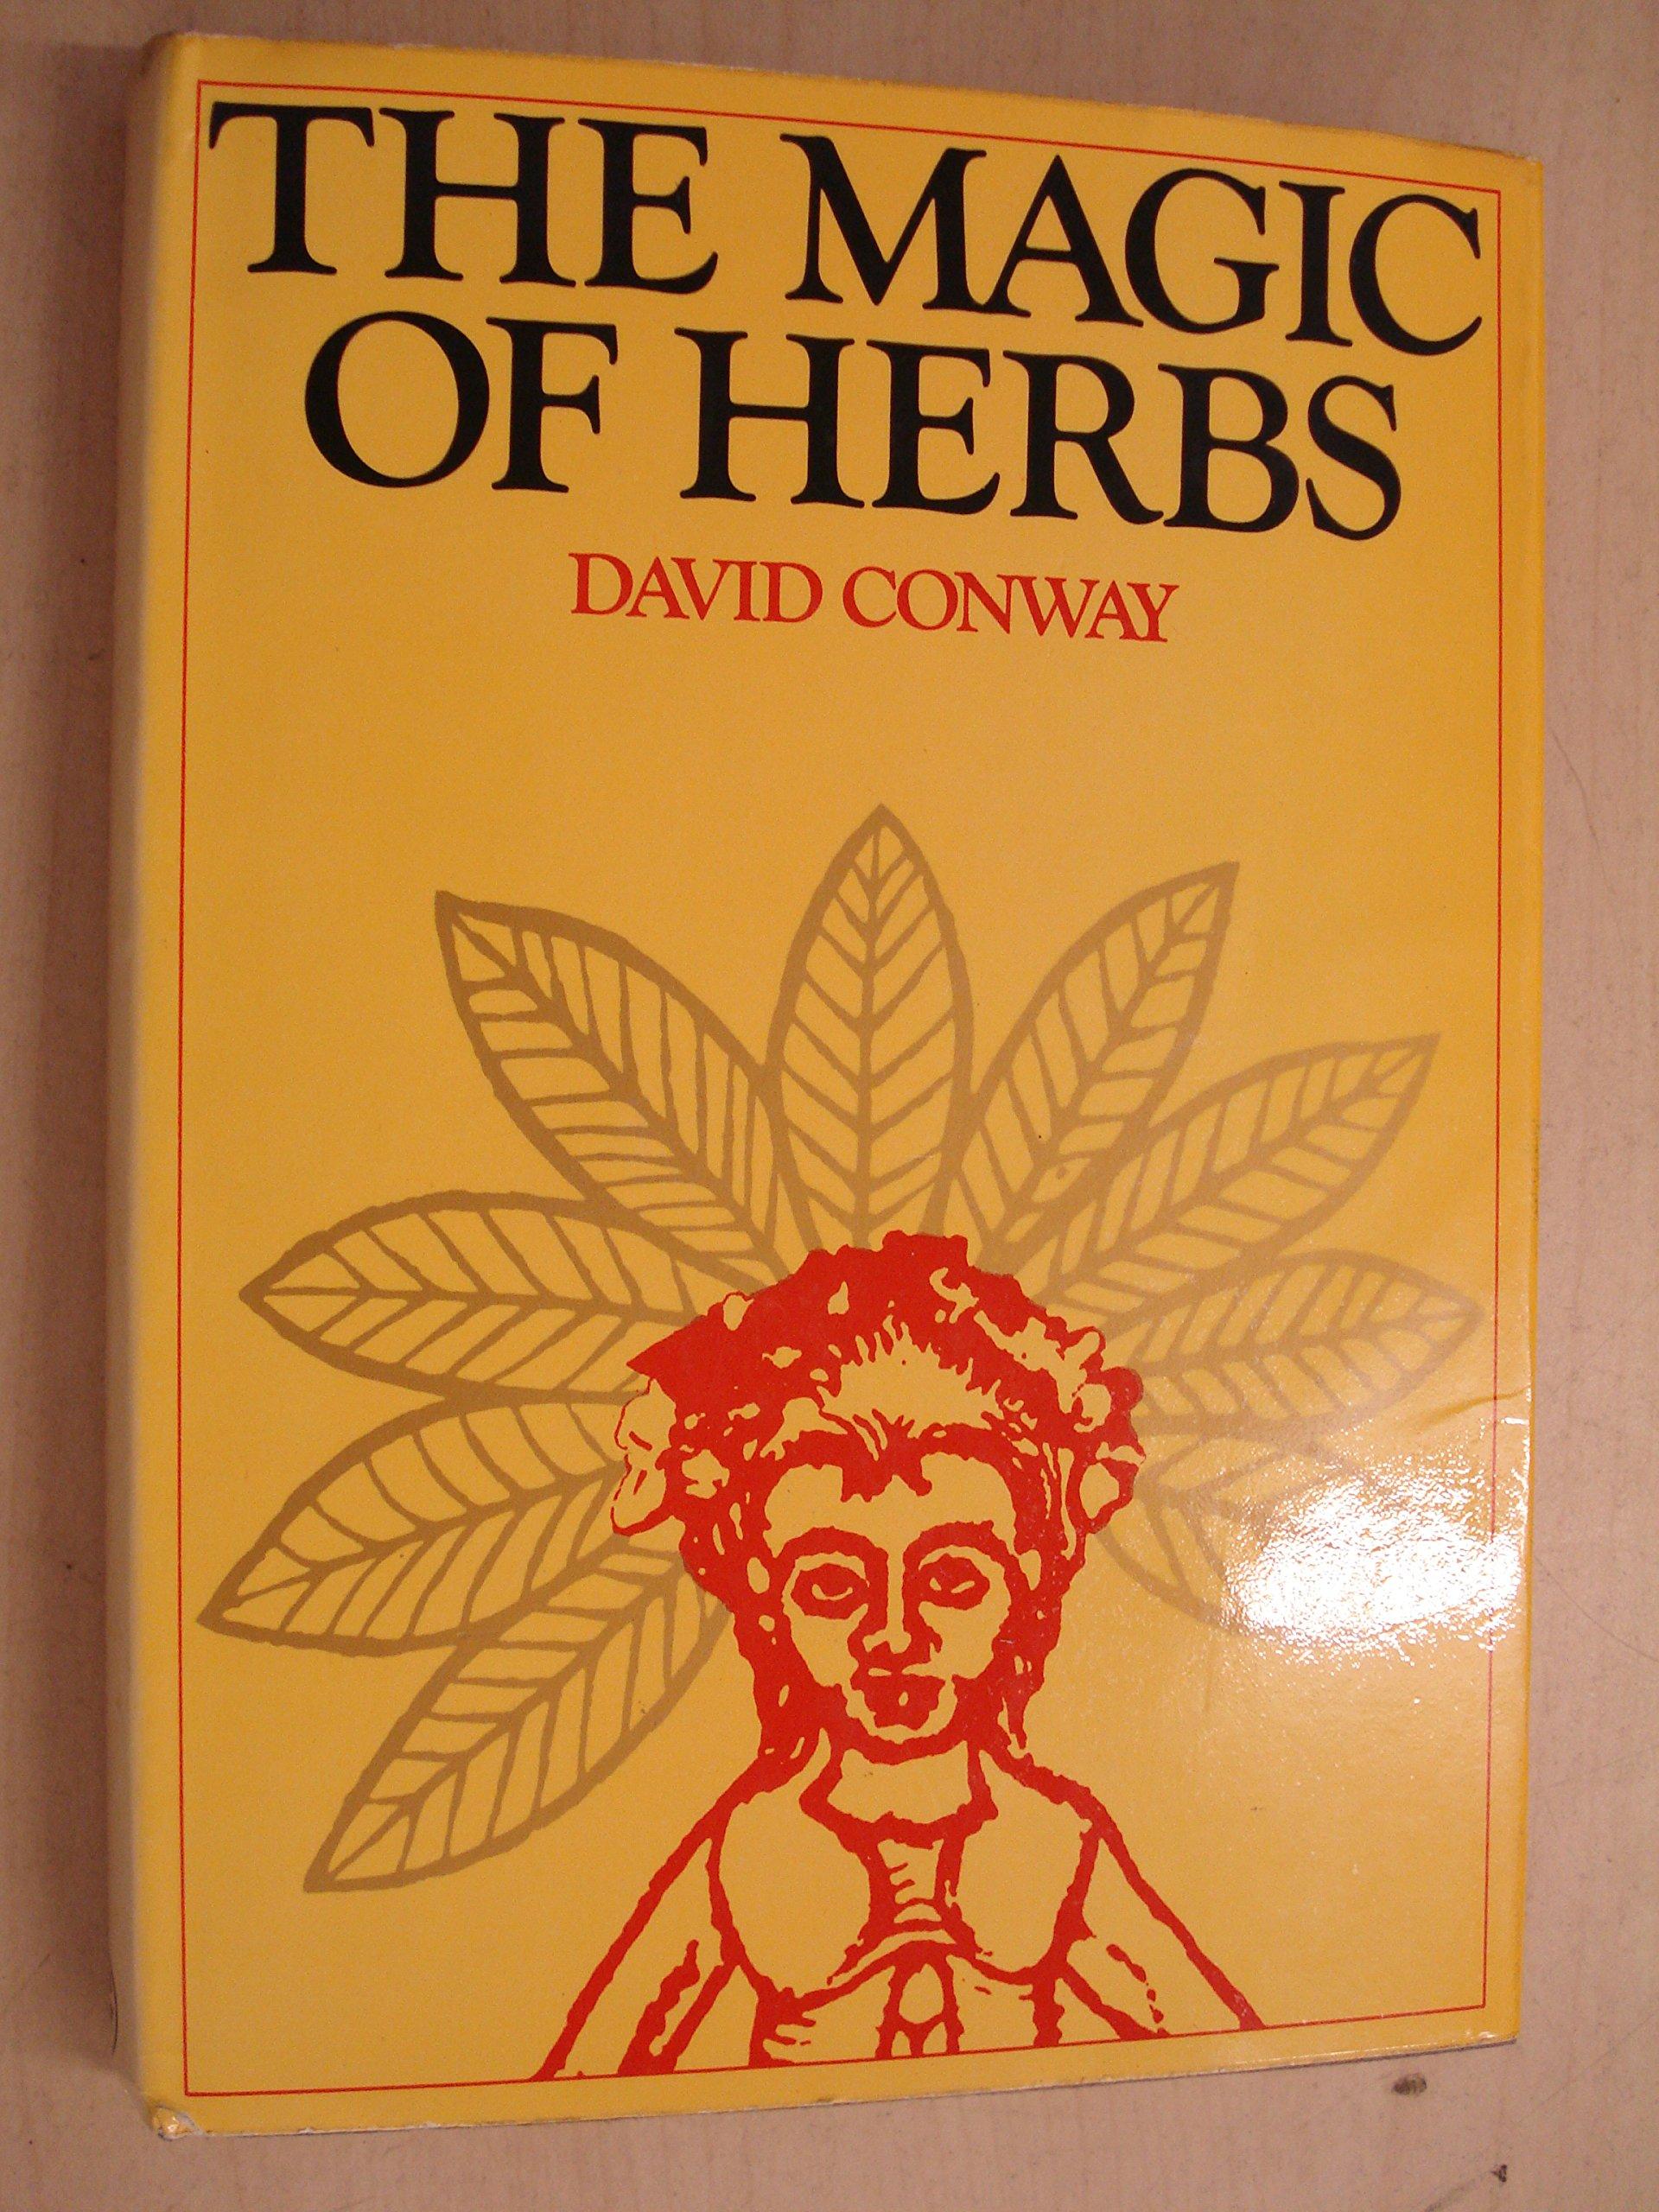 The Magic of Herbs: David Conway: 9780224008365: Amazon com